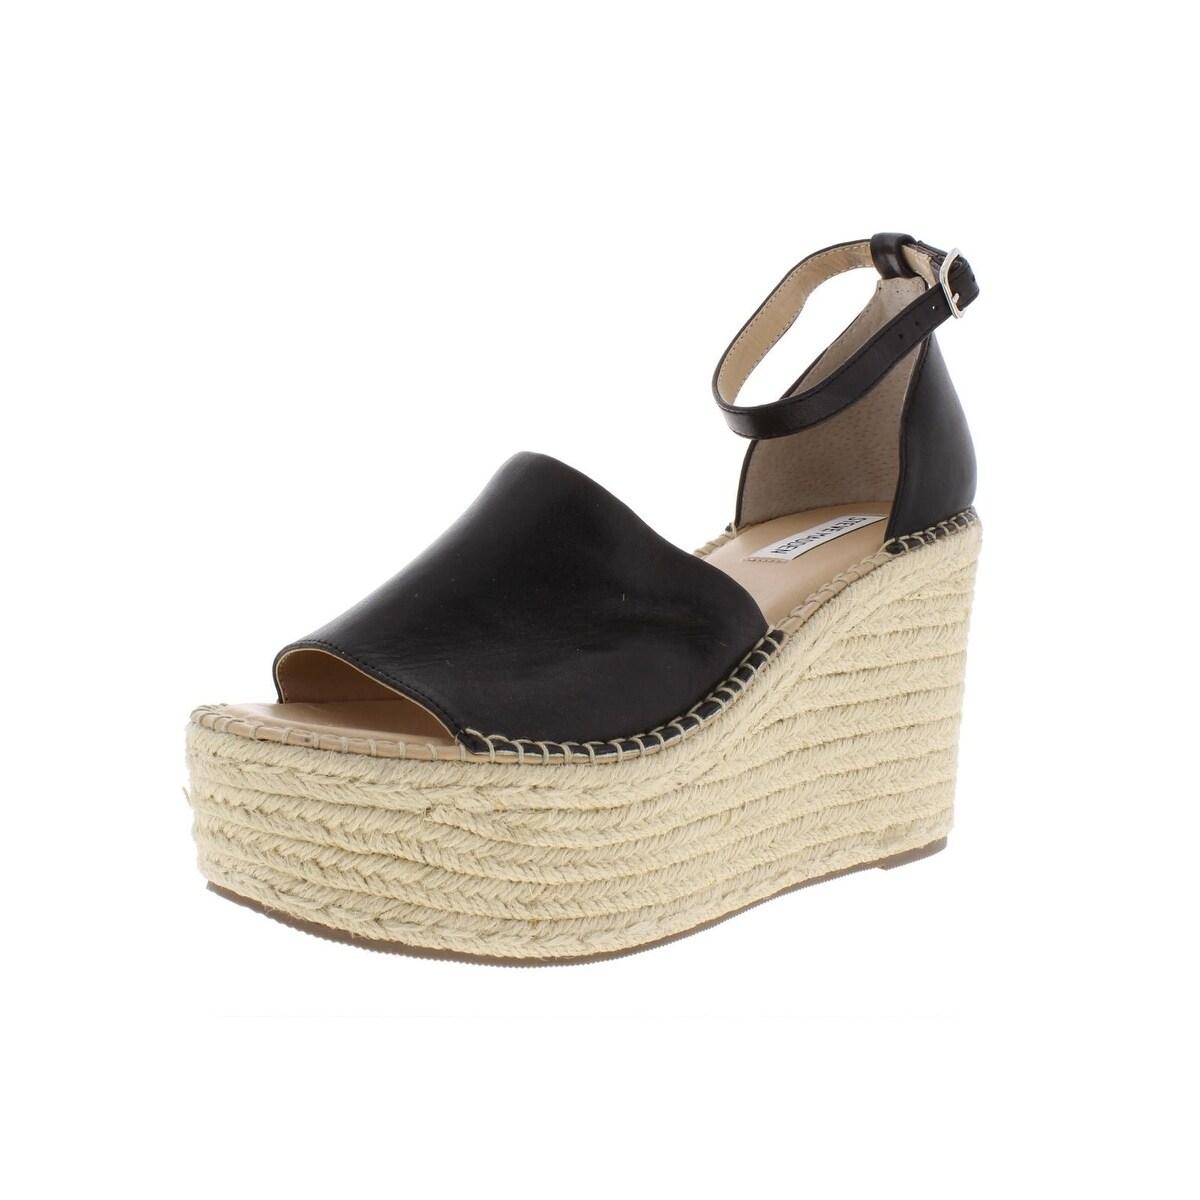 eb3f99e38b2 Steve Madden Womens Sway Platform Sandals Padded Insole Espadrilles